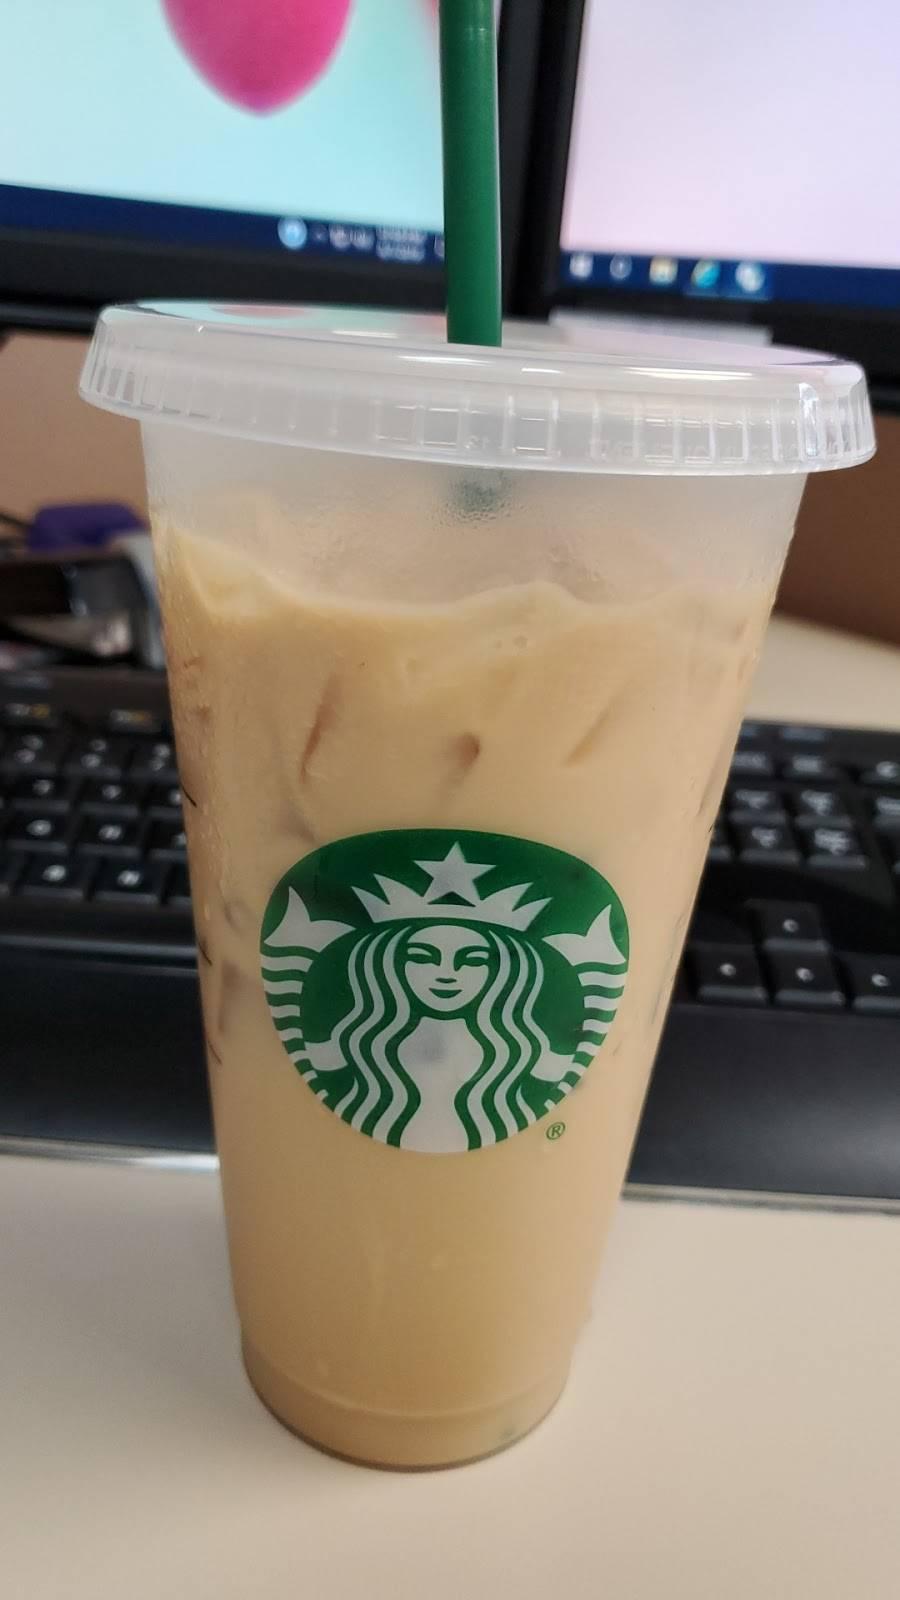 Starbucks - cafe    Photo 2 of 2   Address: 7501 San Dario Ave, Laredo, TX 78045, USA   Phone: (956) 722-6800